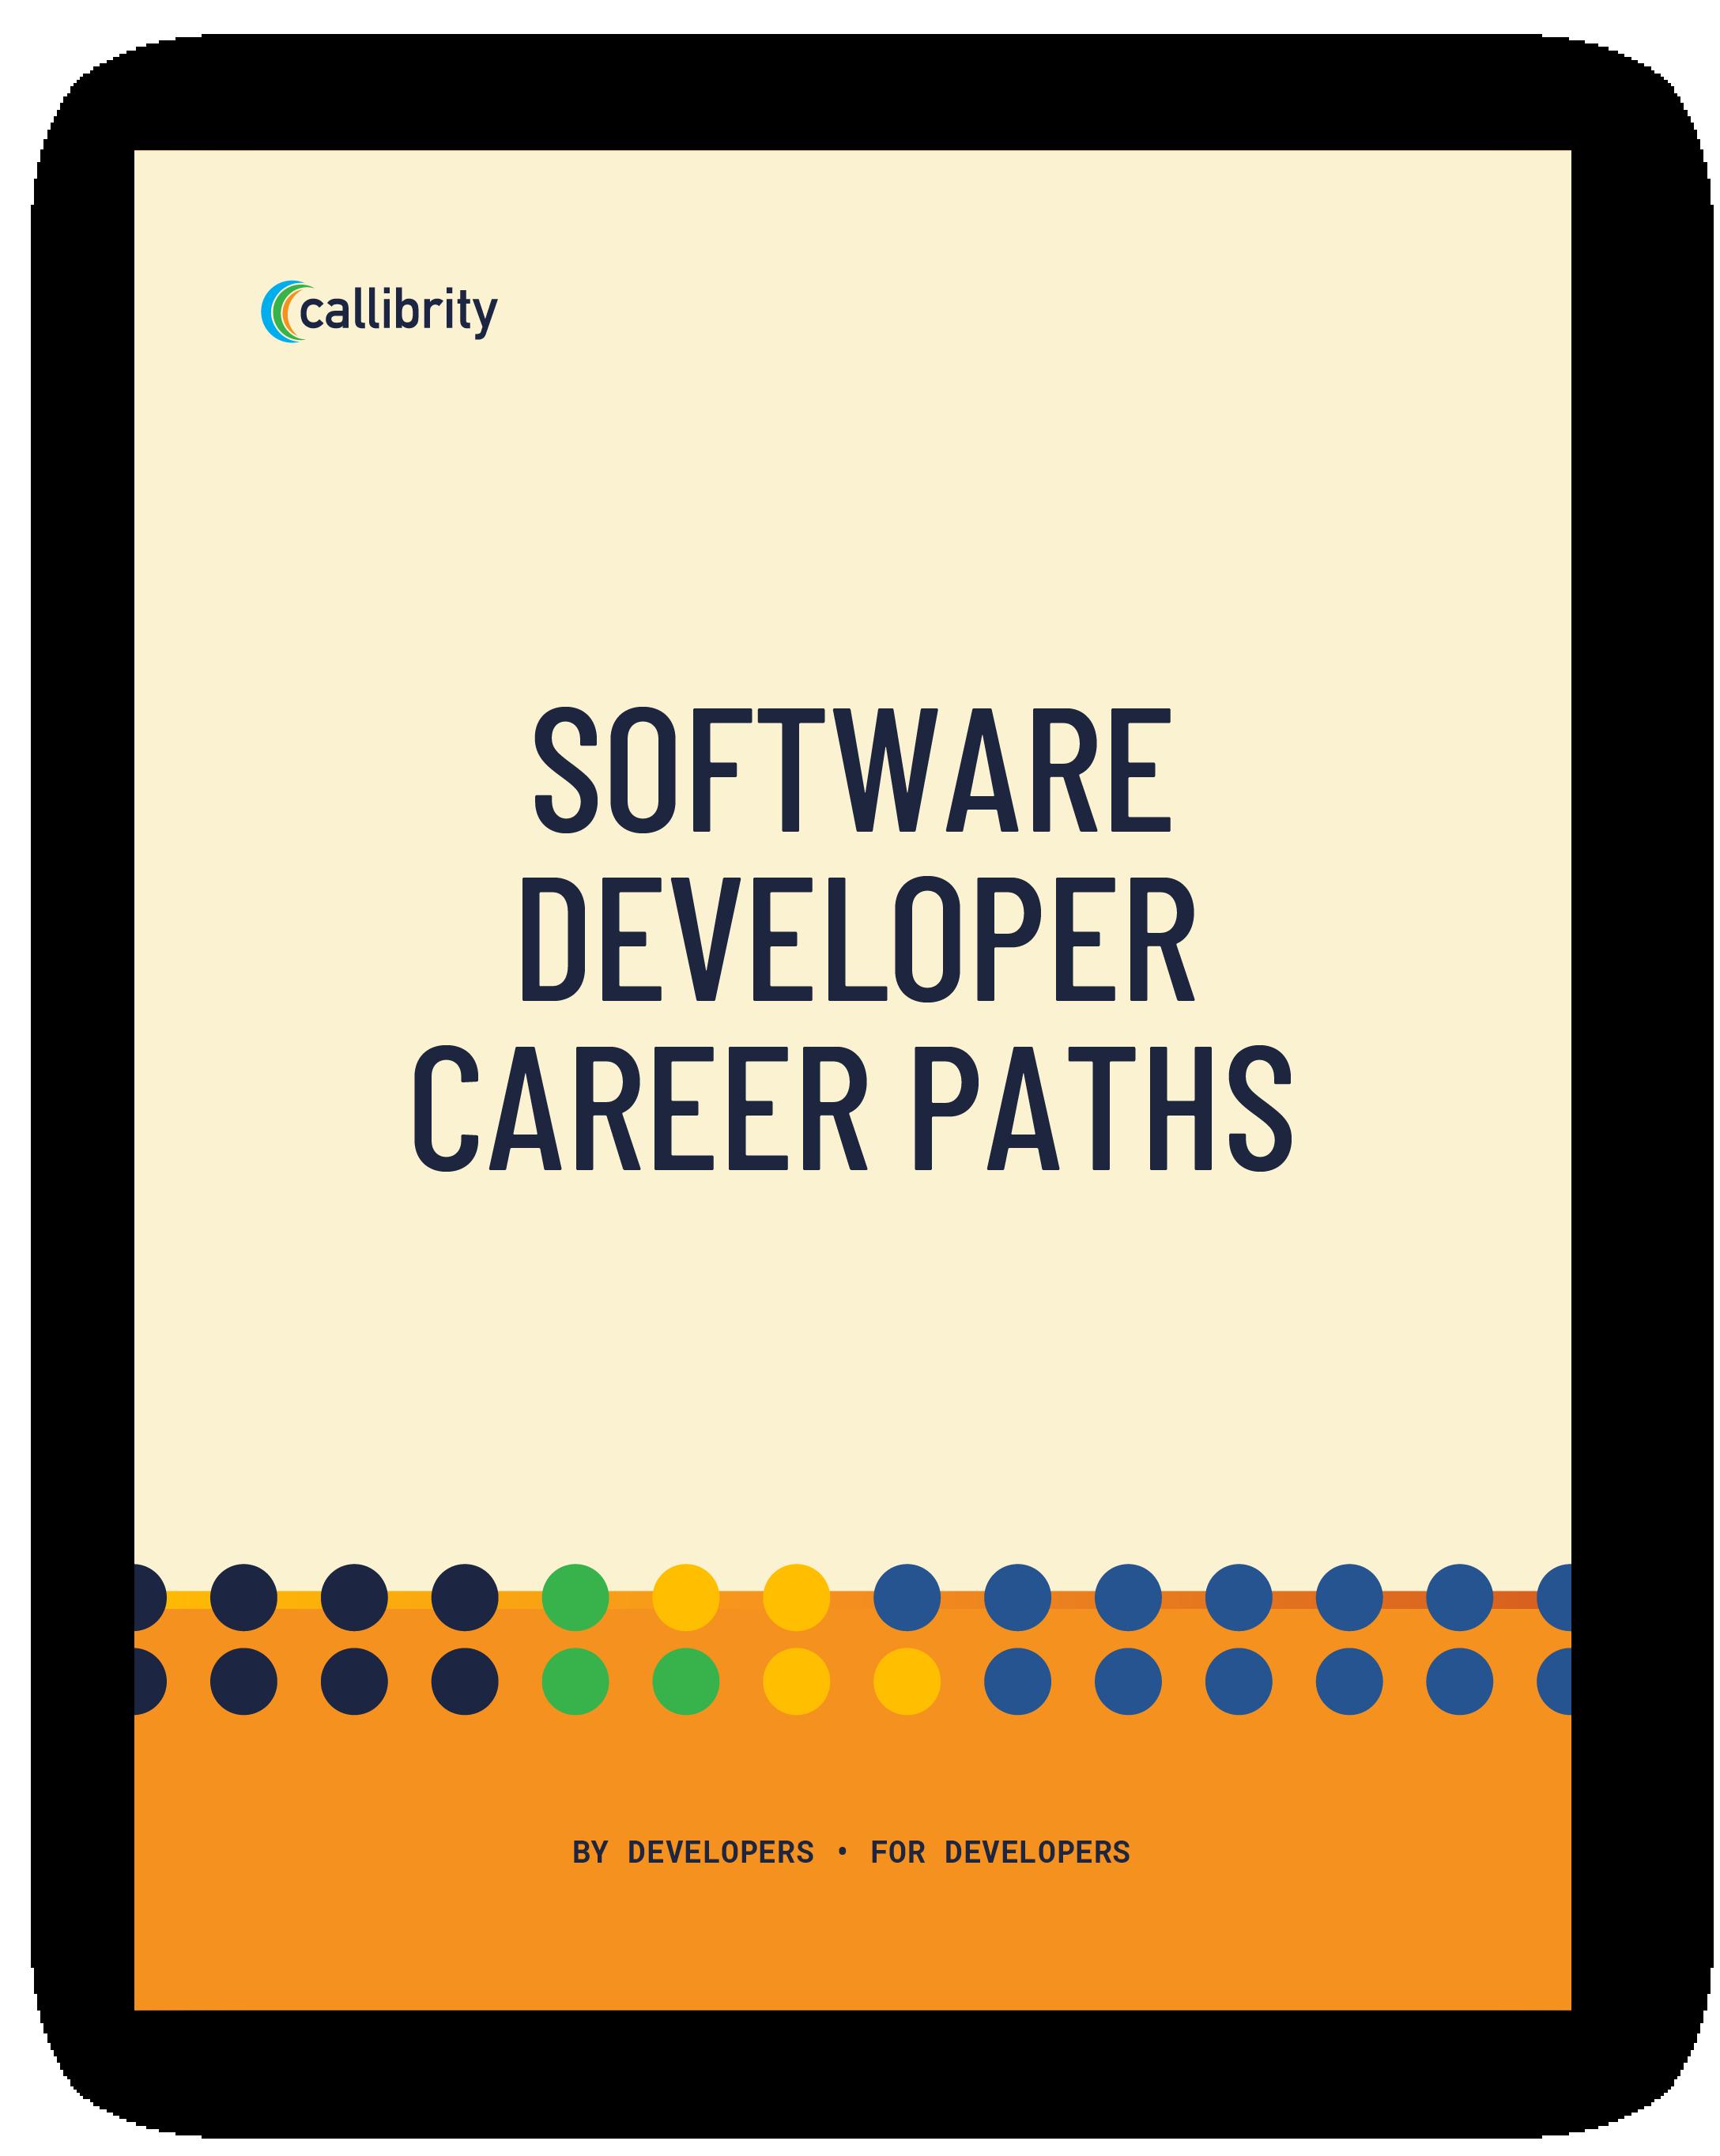 Software Developer Career Paths-06